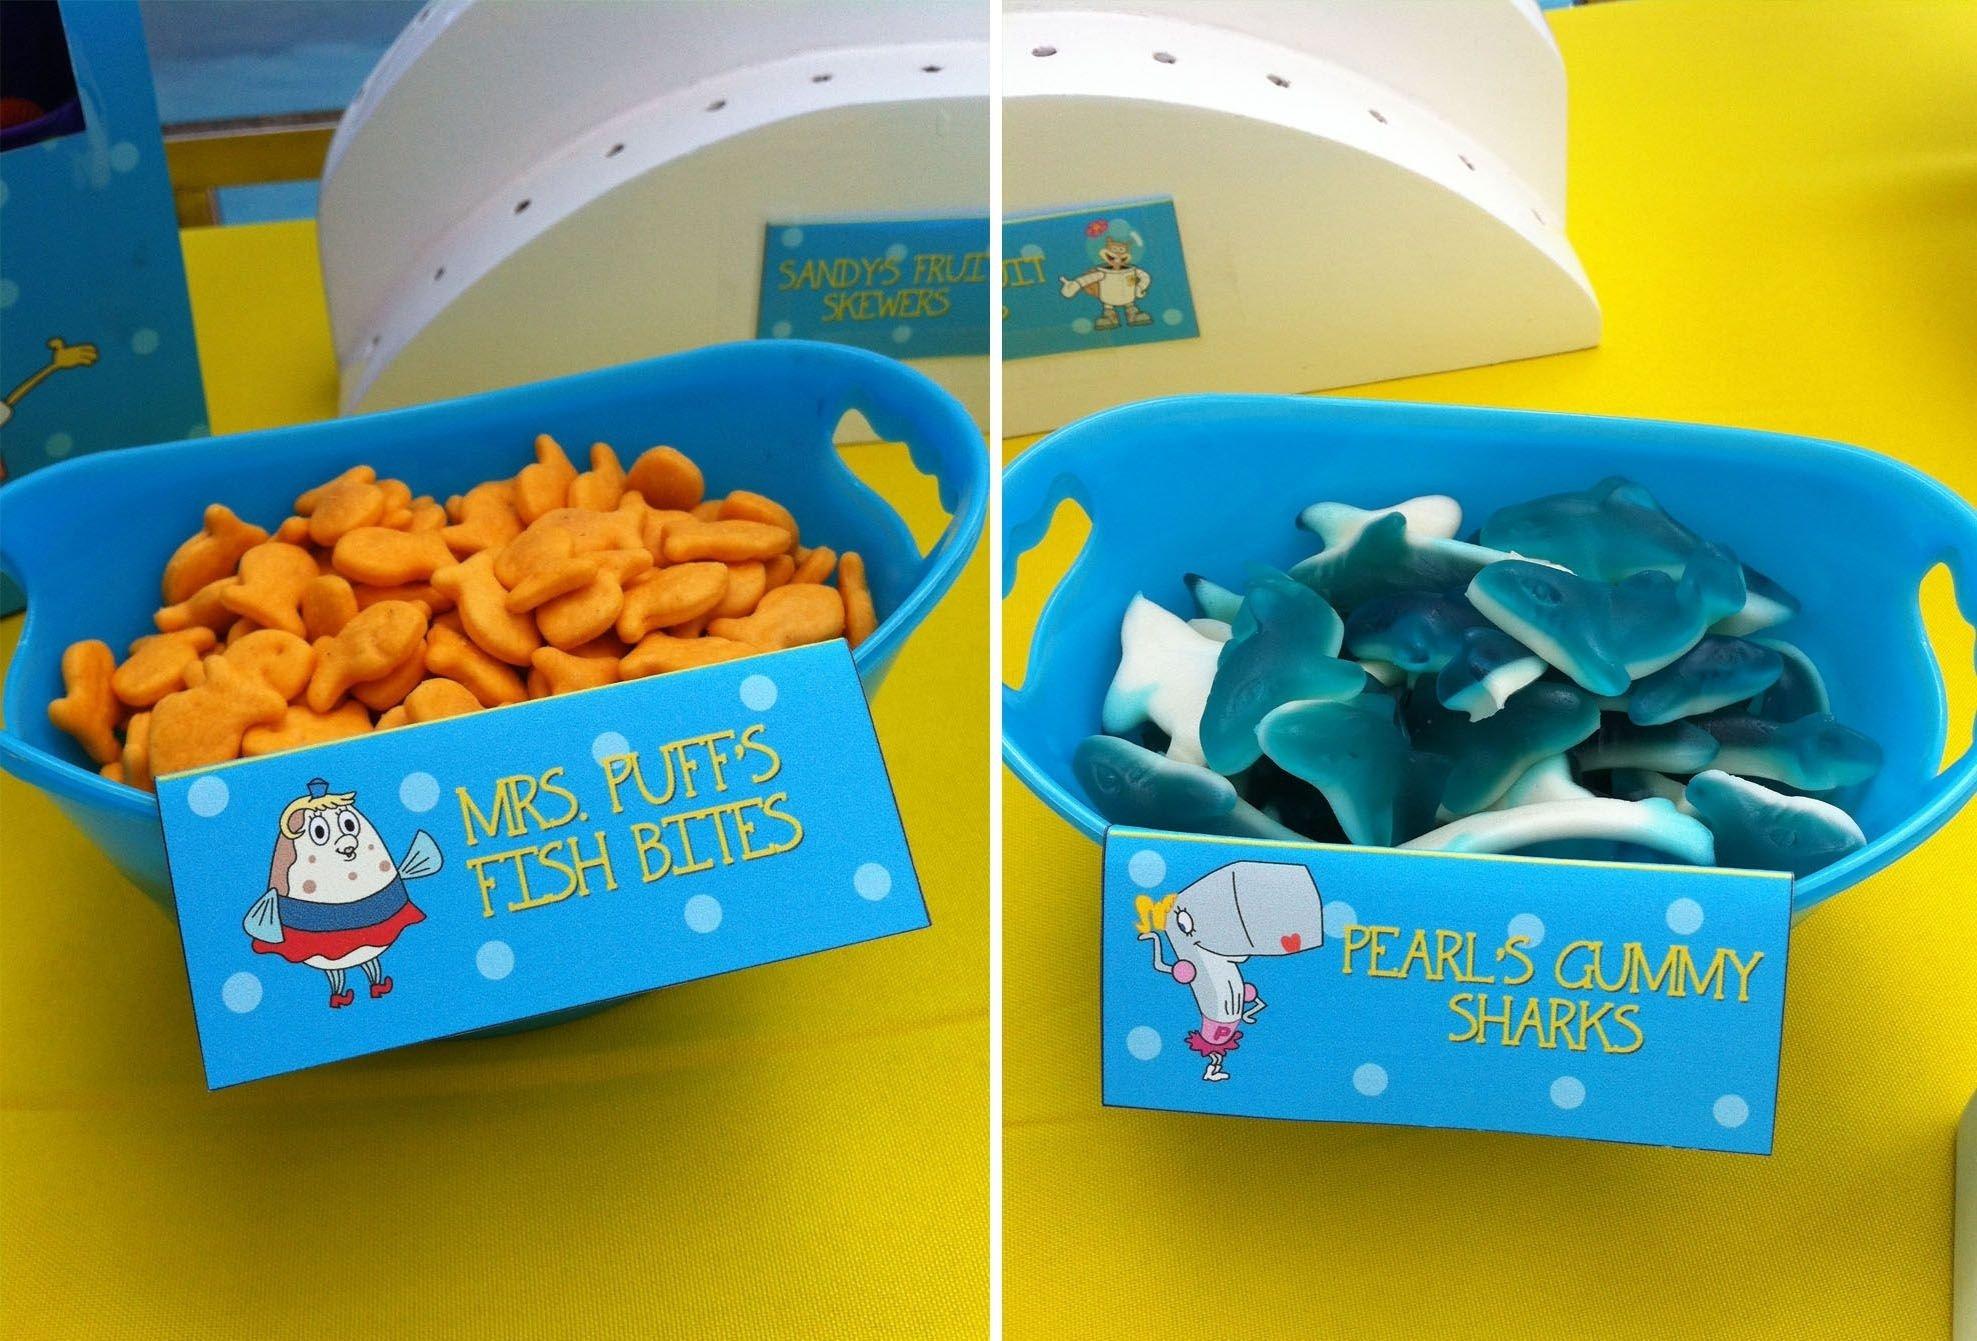 10 Trendy Spongebob Birthday Party Food Ideas spongebob birthday party food ideas fish bites and gummy sharks 2020